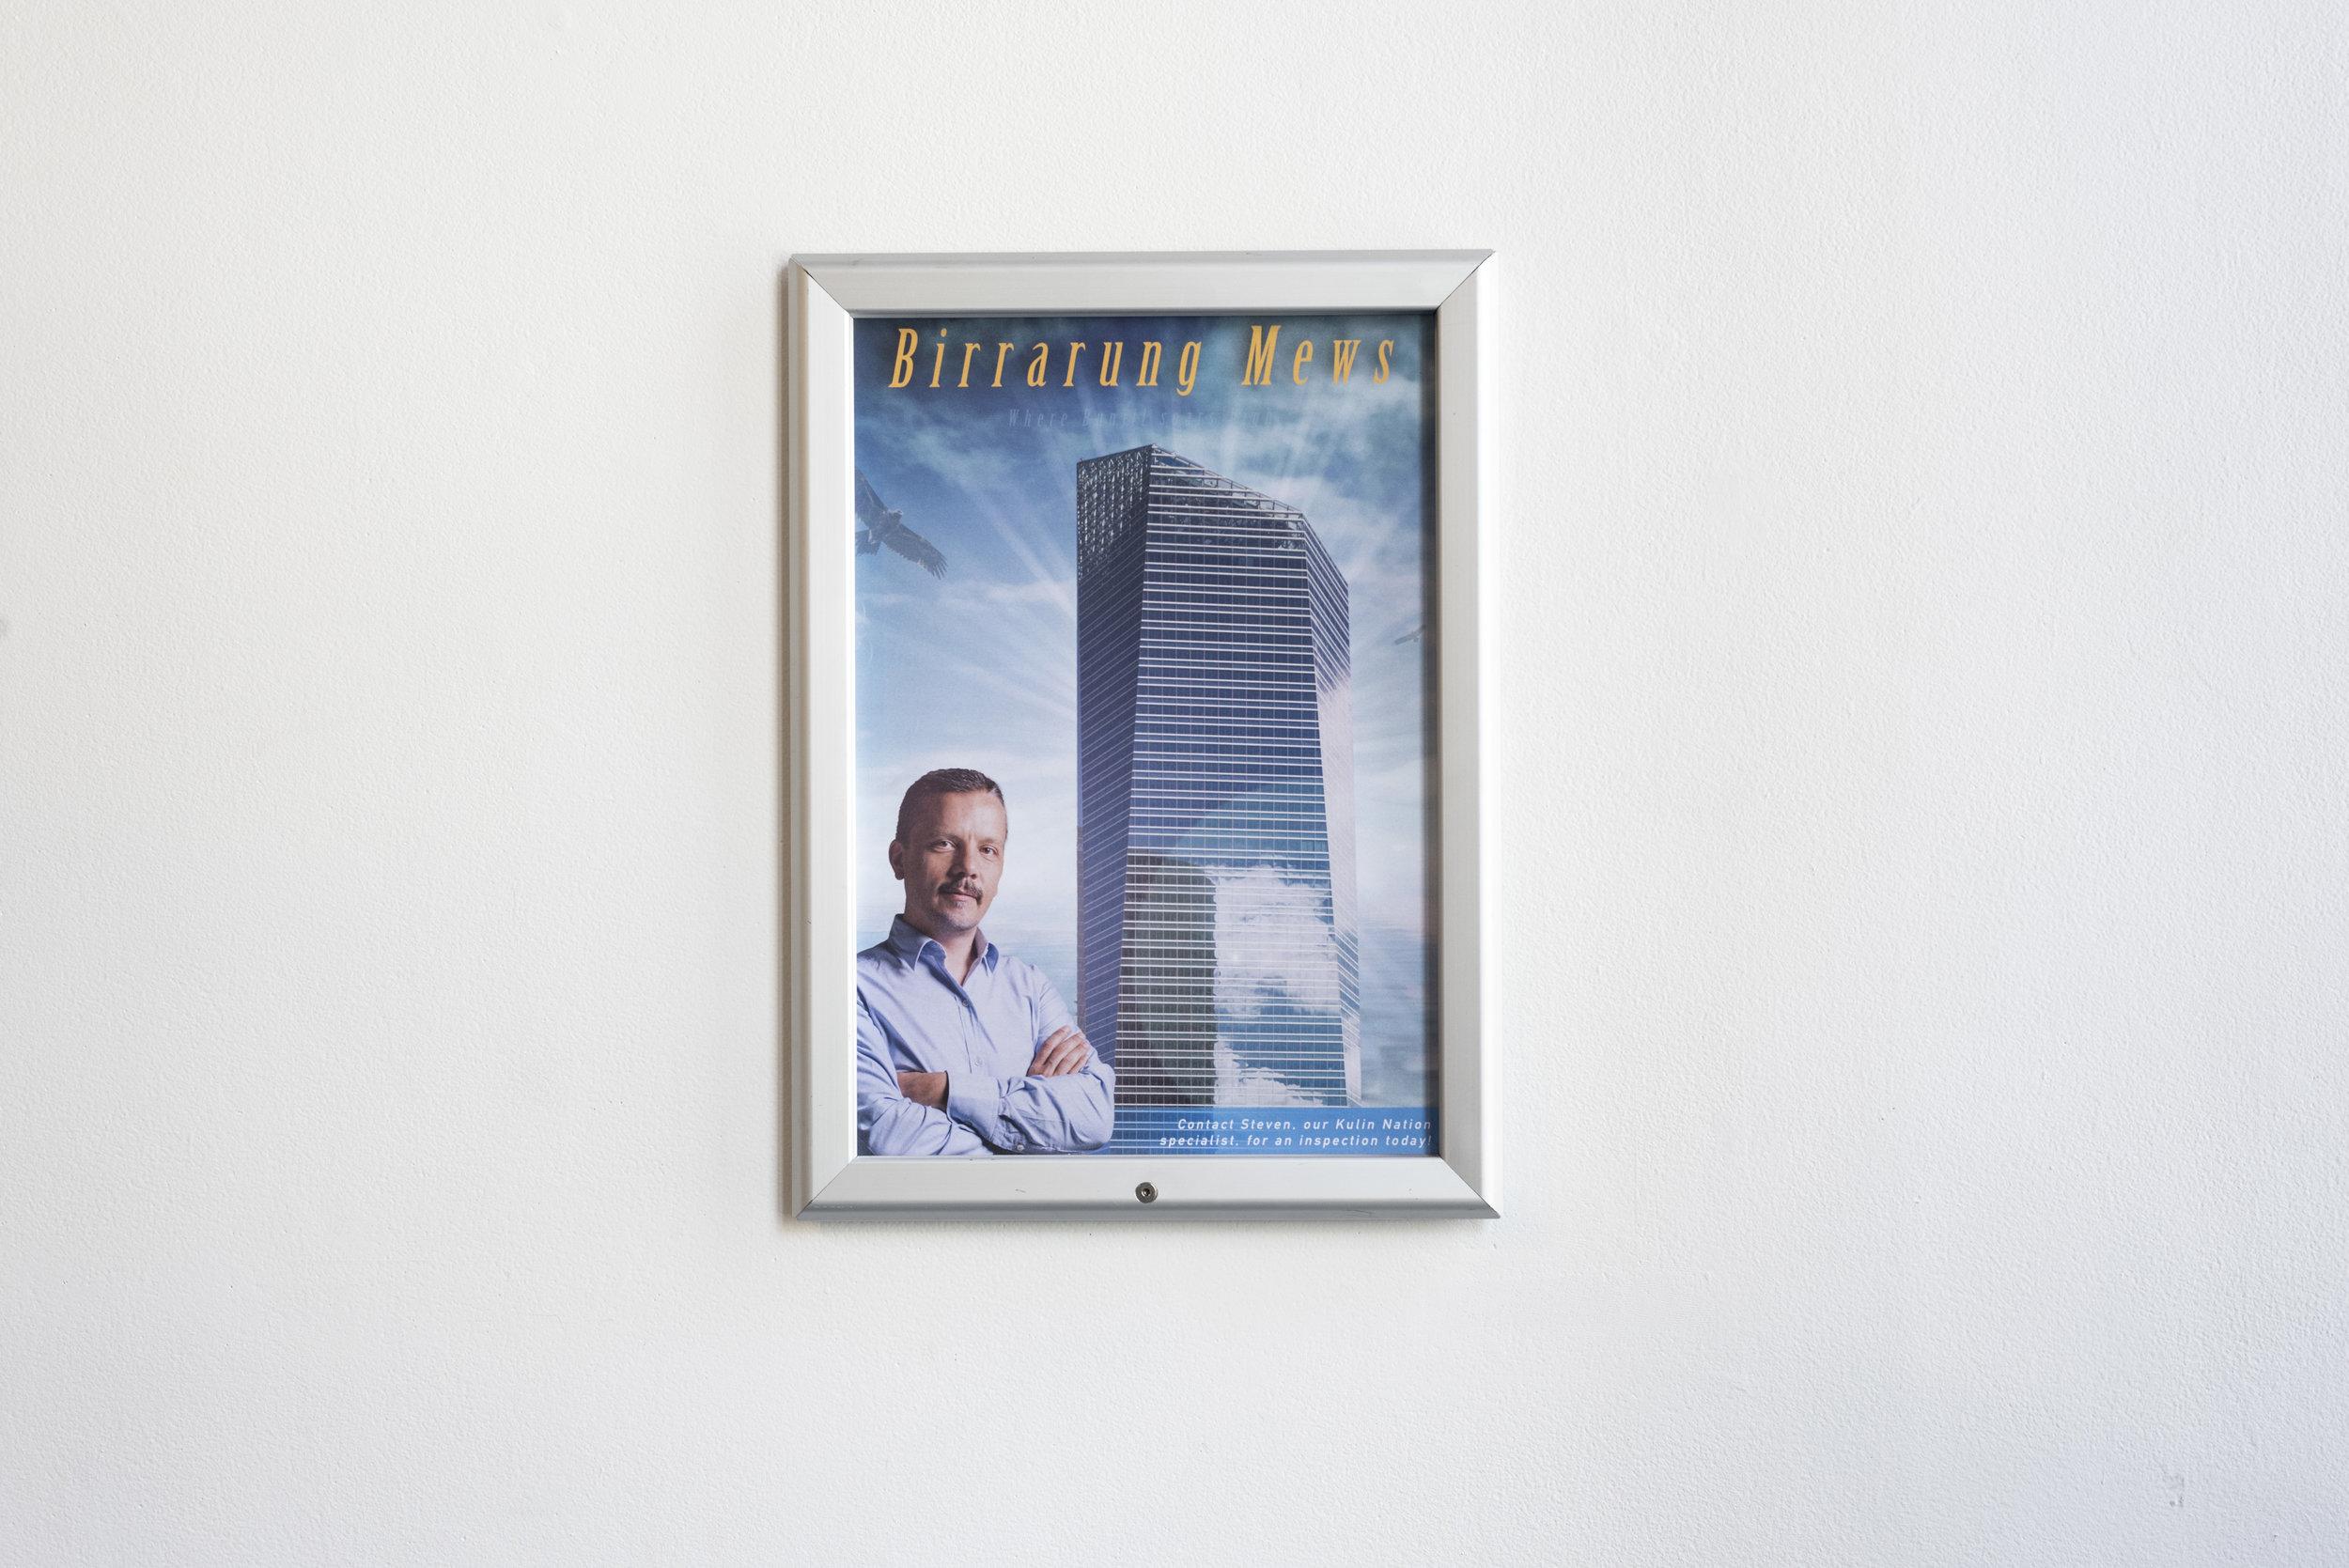 Steven Rhall  Birrarung Mews   Snap frame, poster  46 x 34 cm  2018  Photo by Aaron Claringbold